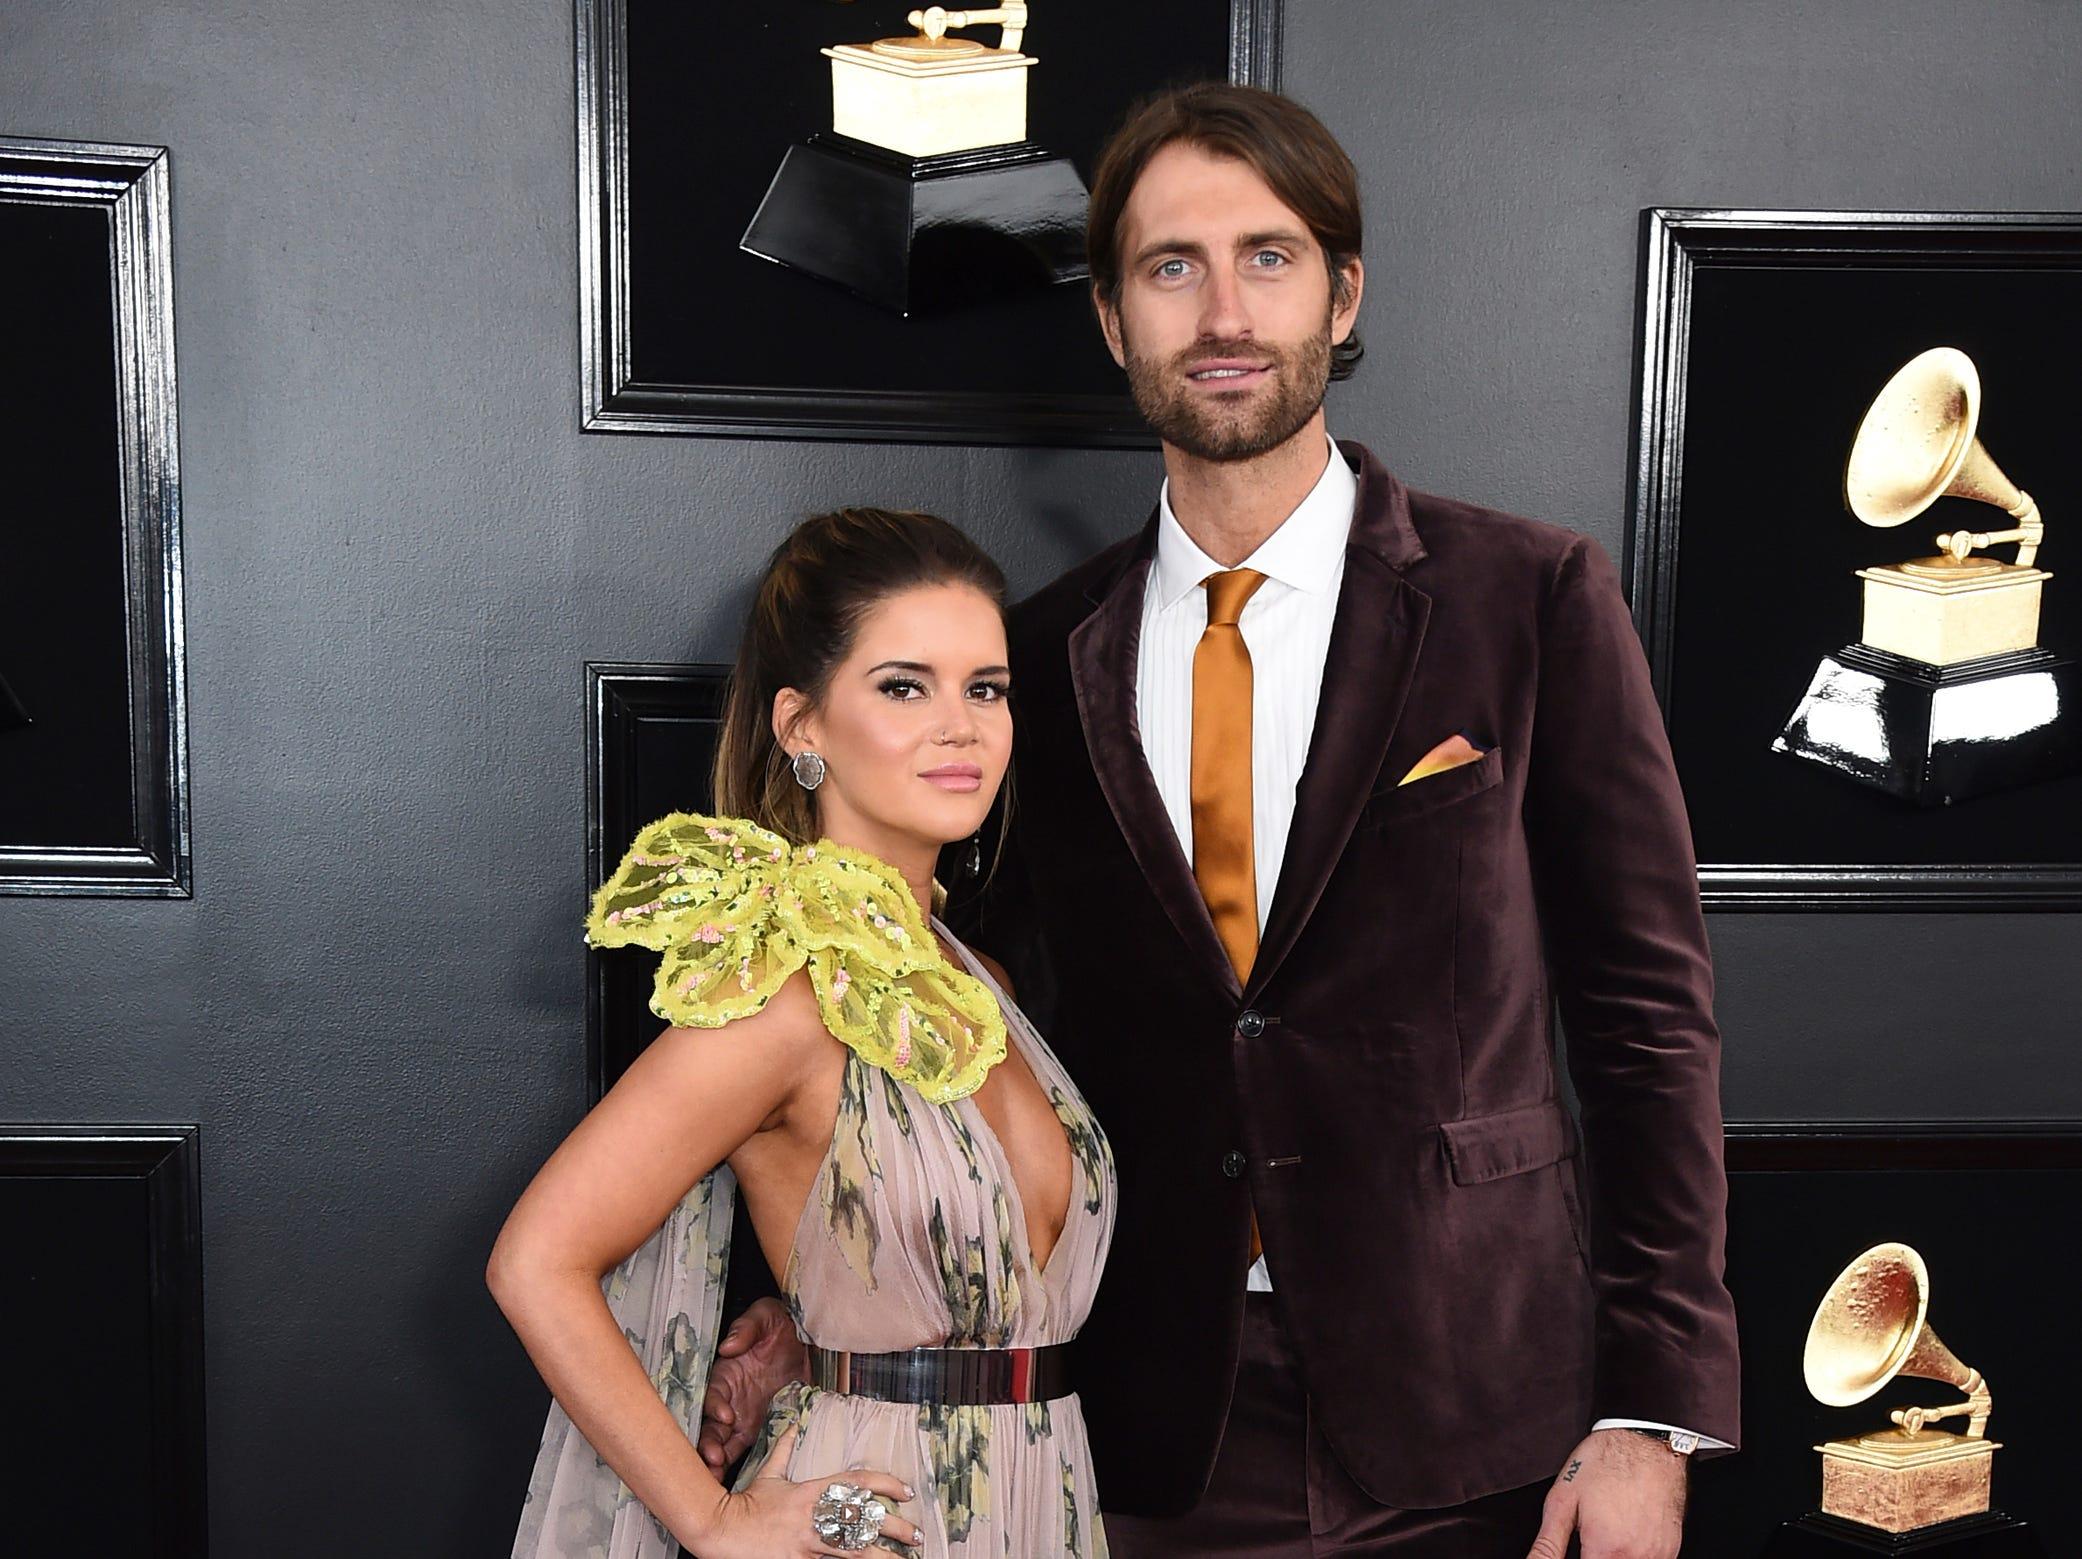 Maren Morris, left, and Ryan Hurd arrive at the 61st annual Grammy Awards.